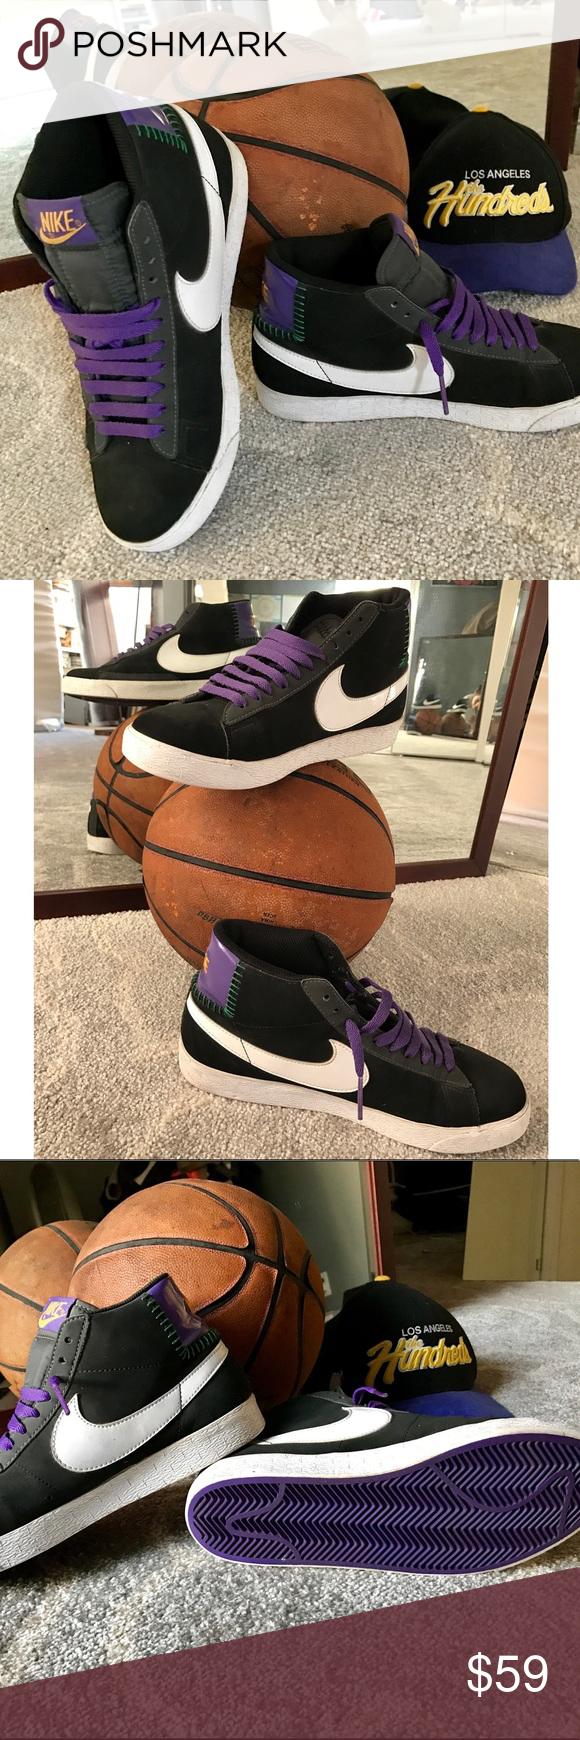 purchase cheap 47b9e 5d3be Nike Blazers Hi Black Suede w  Purple Size 7.5 Men Nike Men s Blazers Black  Sneaker. Color  Black suede with Purple Patent Leather detail on the heel.